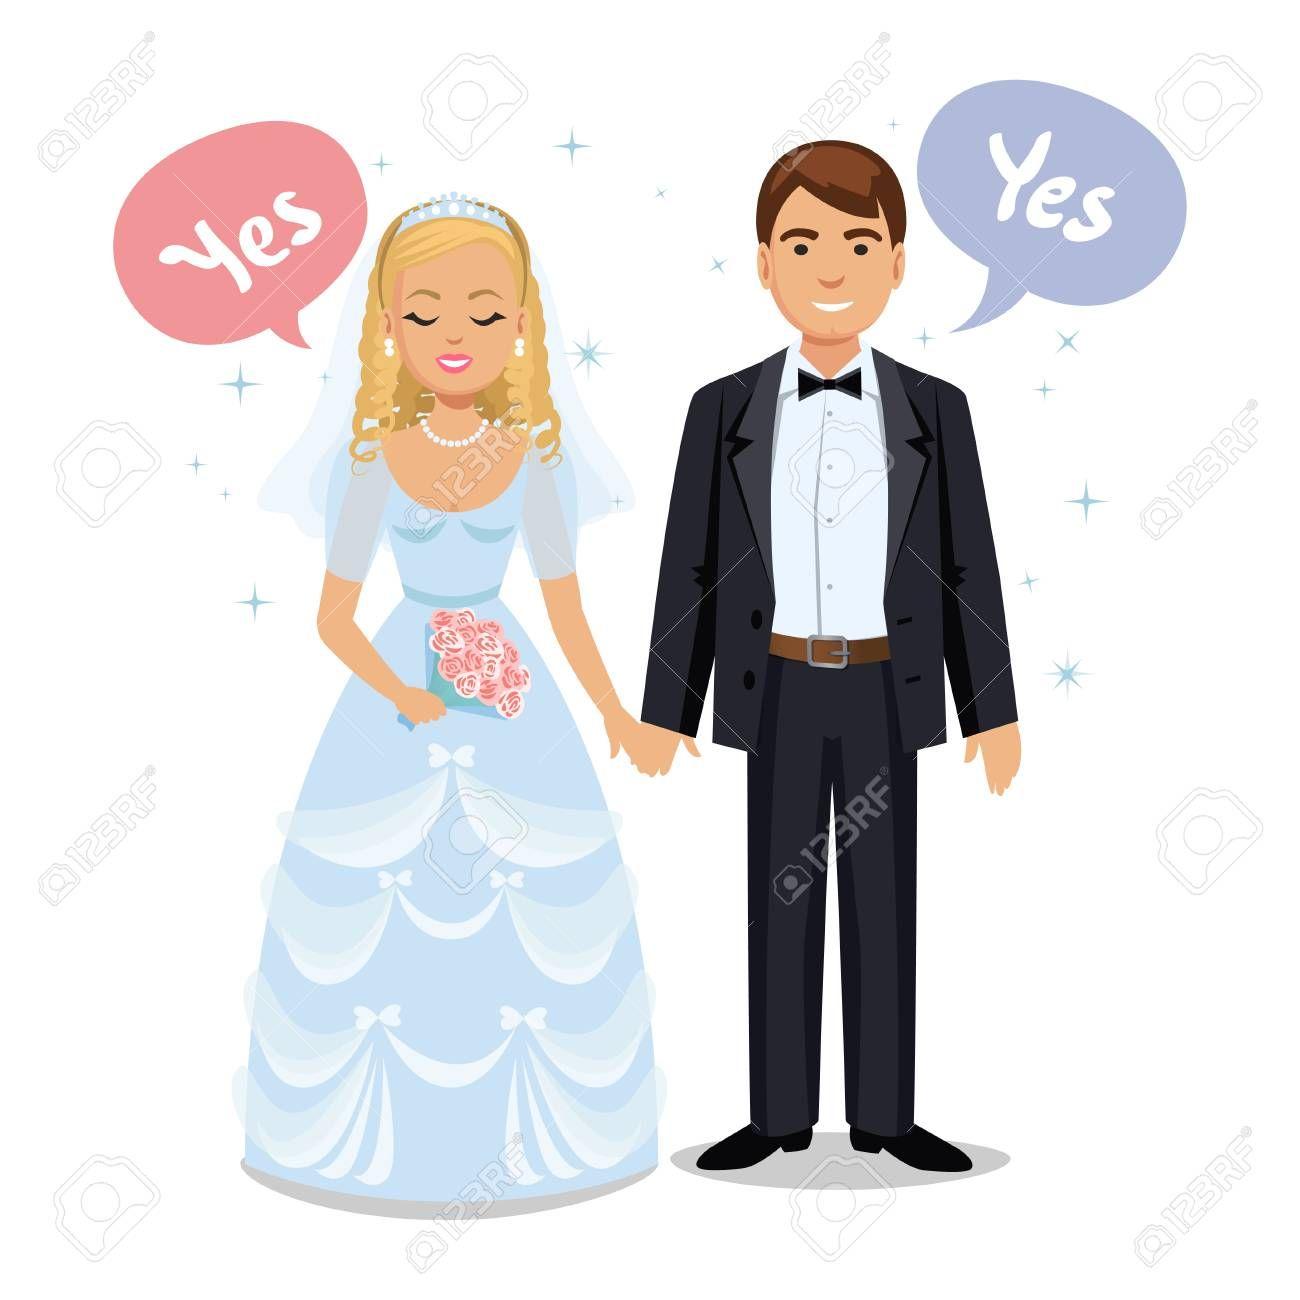 Happy Wedding Couple Wedding Couple Say Yes Bride And Groom On Their Wedding Day Wedding Couple Vector Illustration Isolated On White Background Cute Cartoo Bride And Groom Cartoon Happy Wedding Wedding